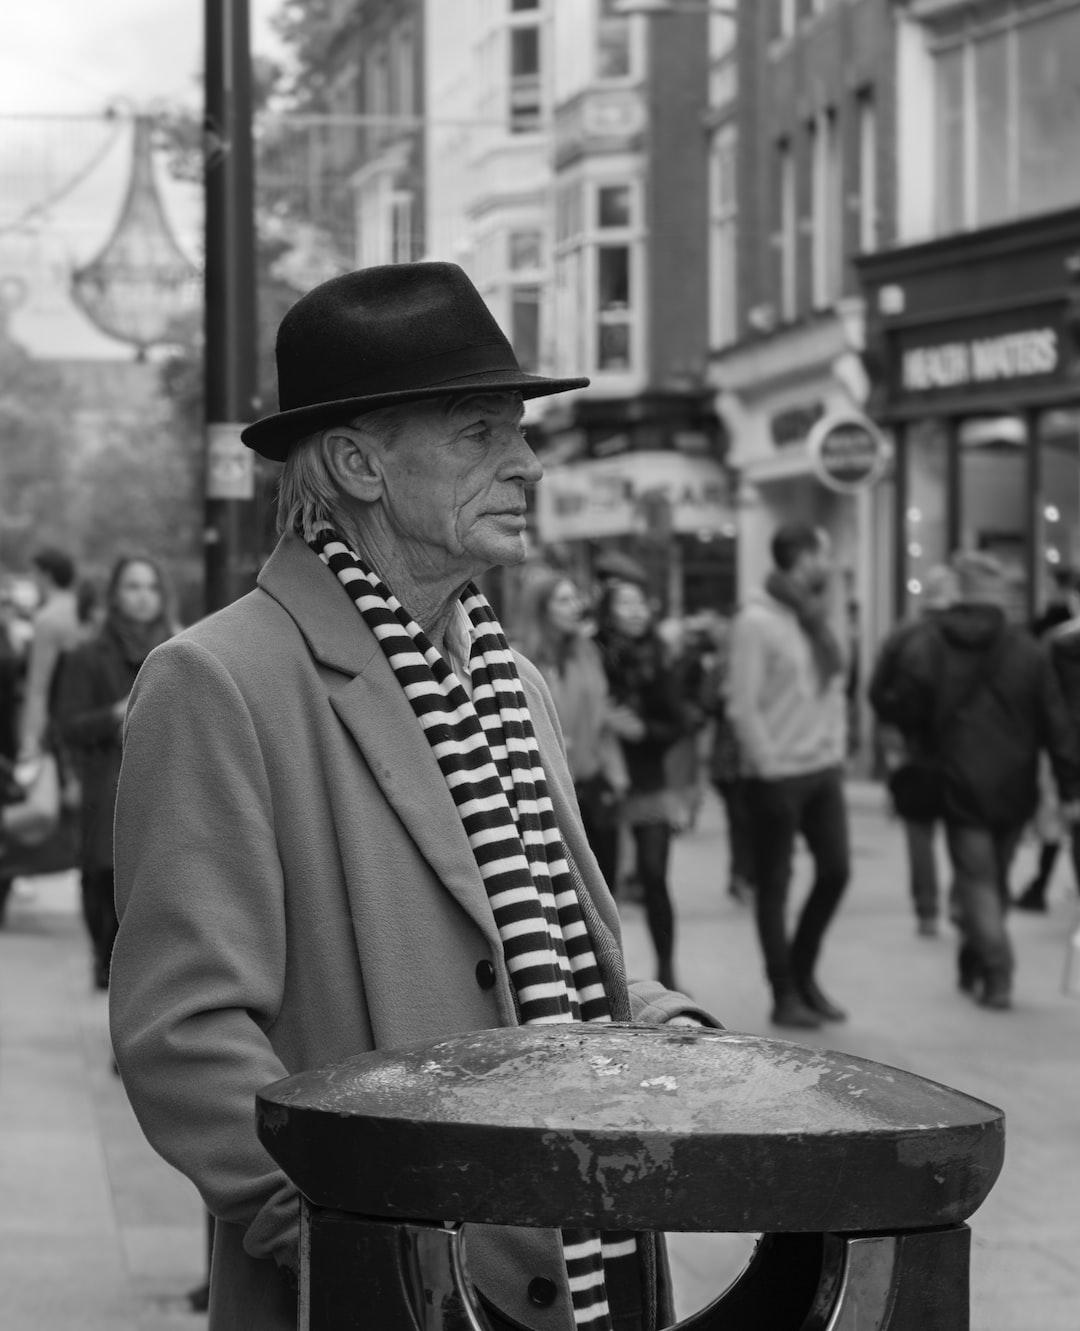 Dress to impress. An image of a very slick looking gentlemen on Grafton Street, Dublin.